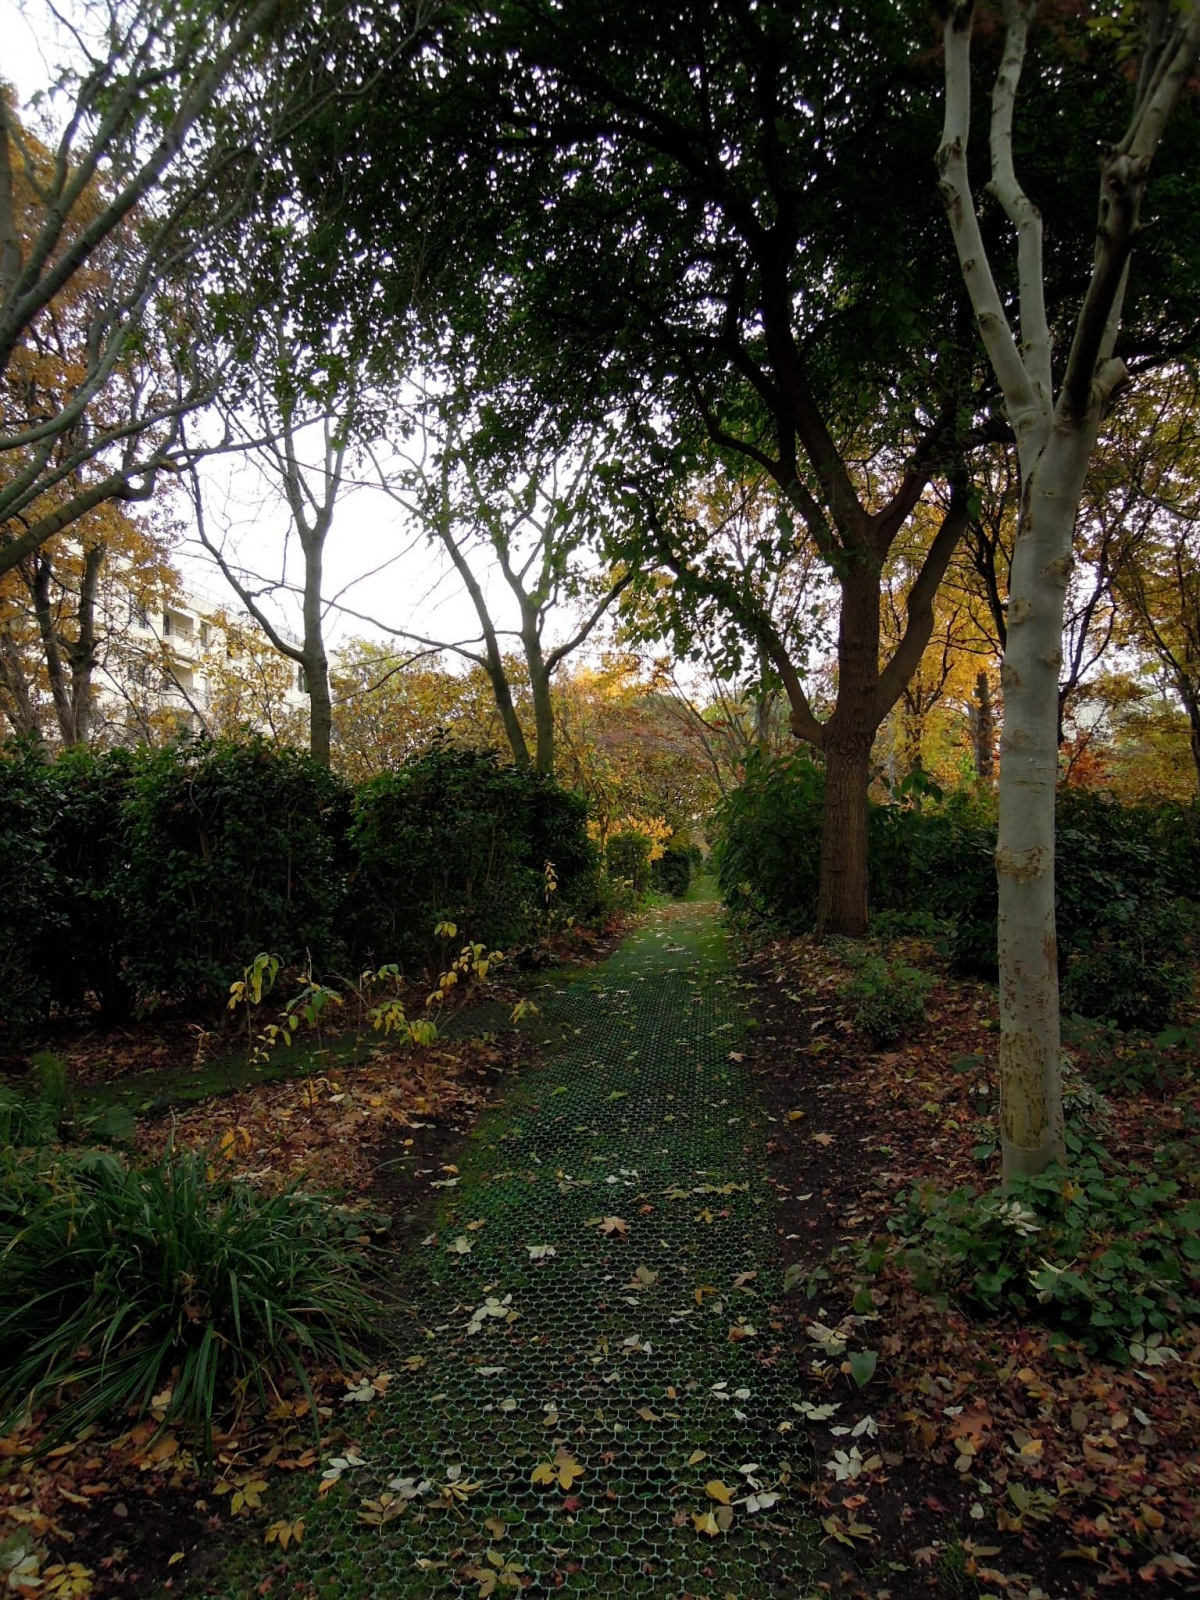 Autumnal grassy path